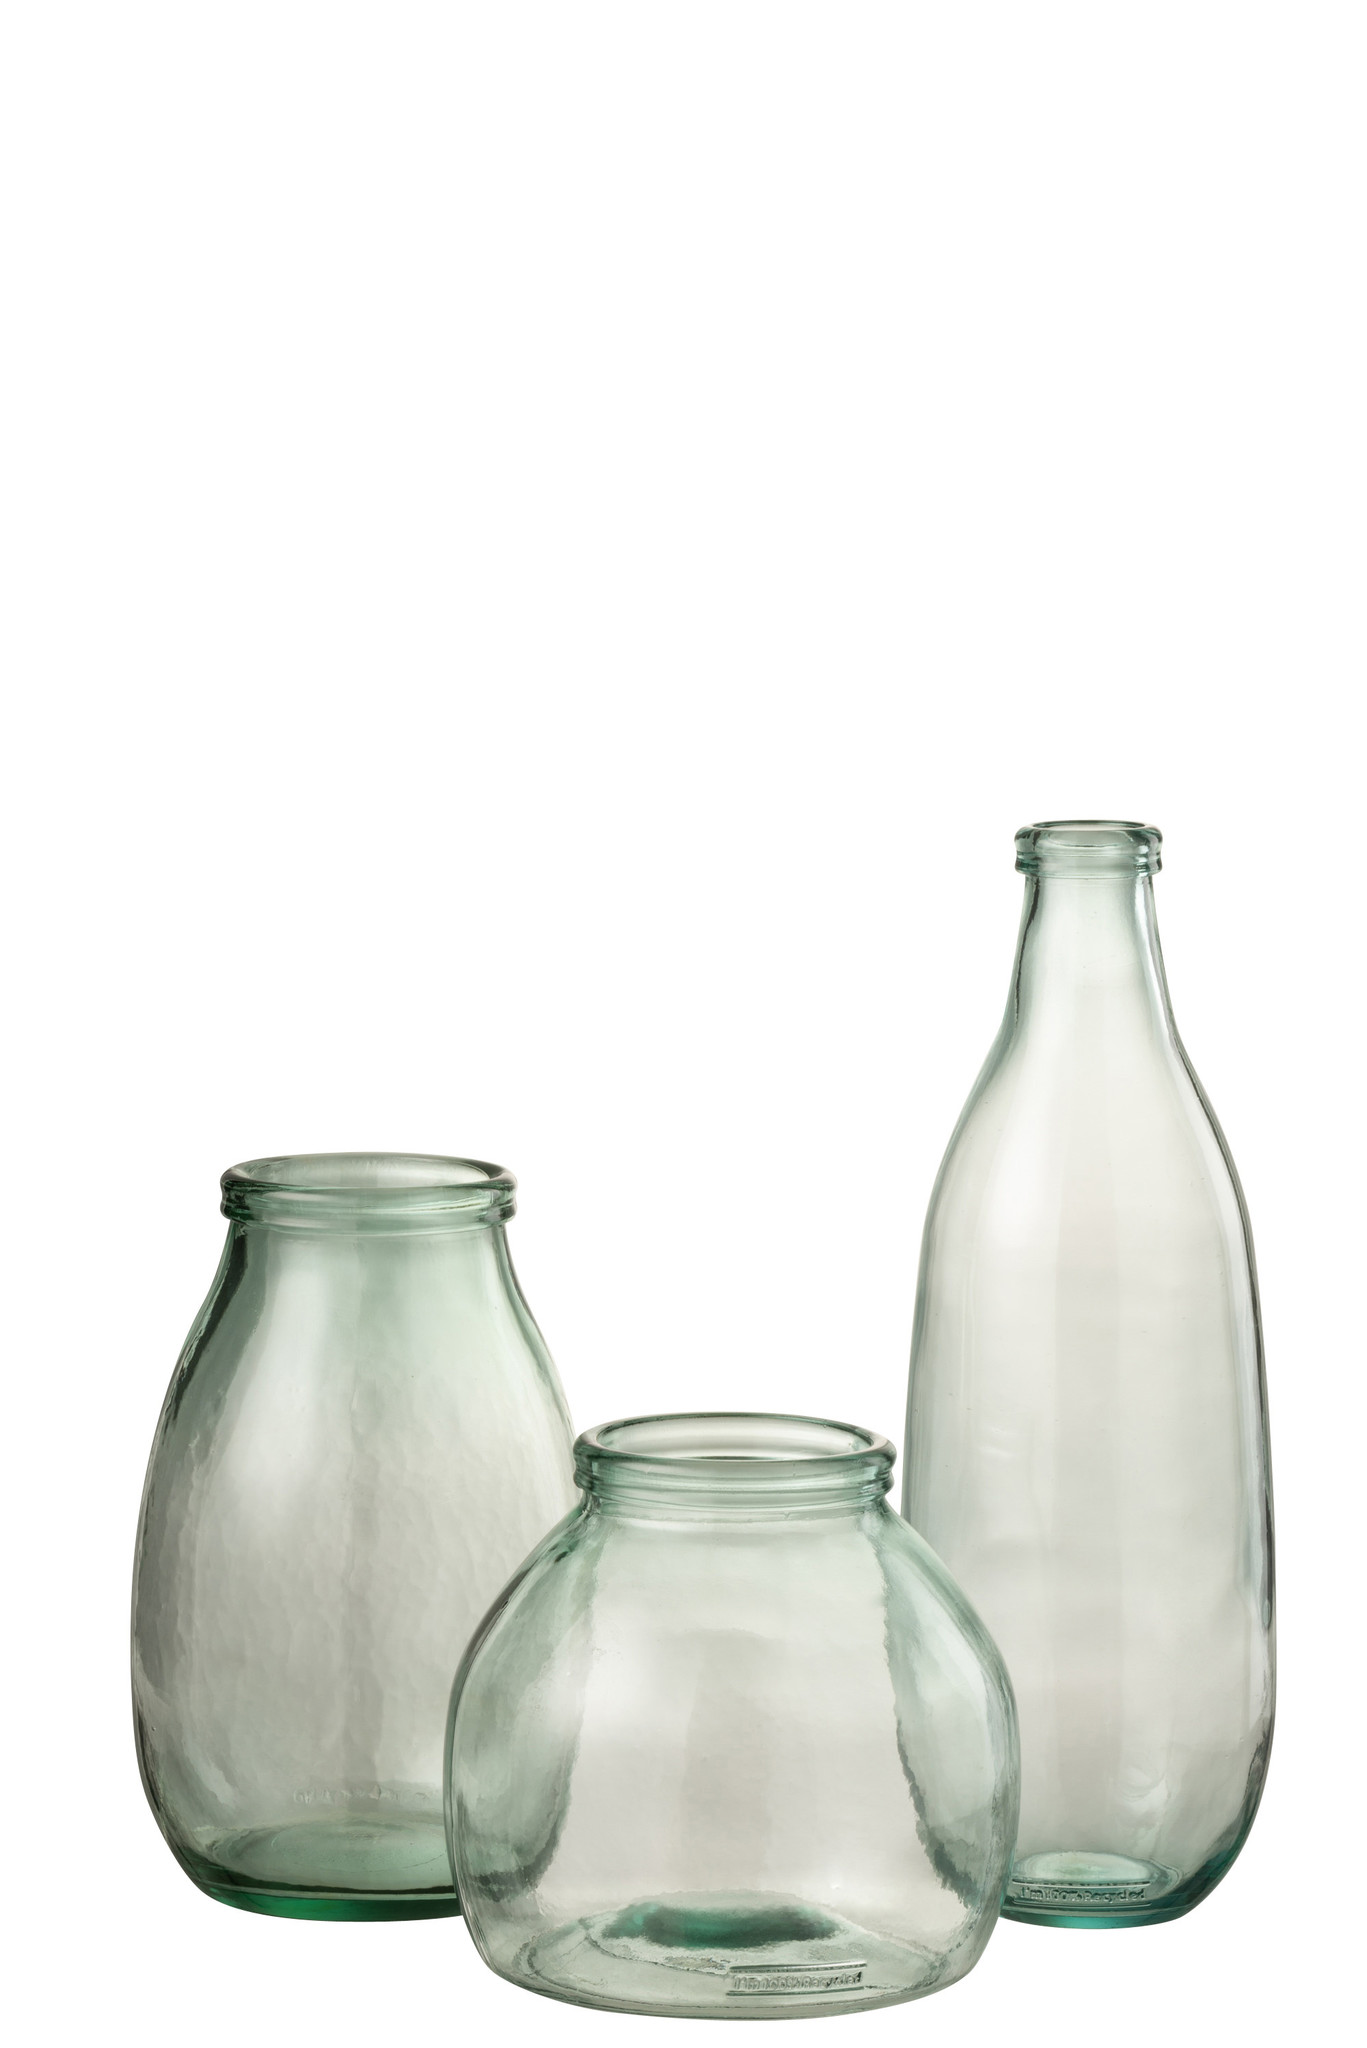 Vaas Fles Glas Transparant-3